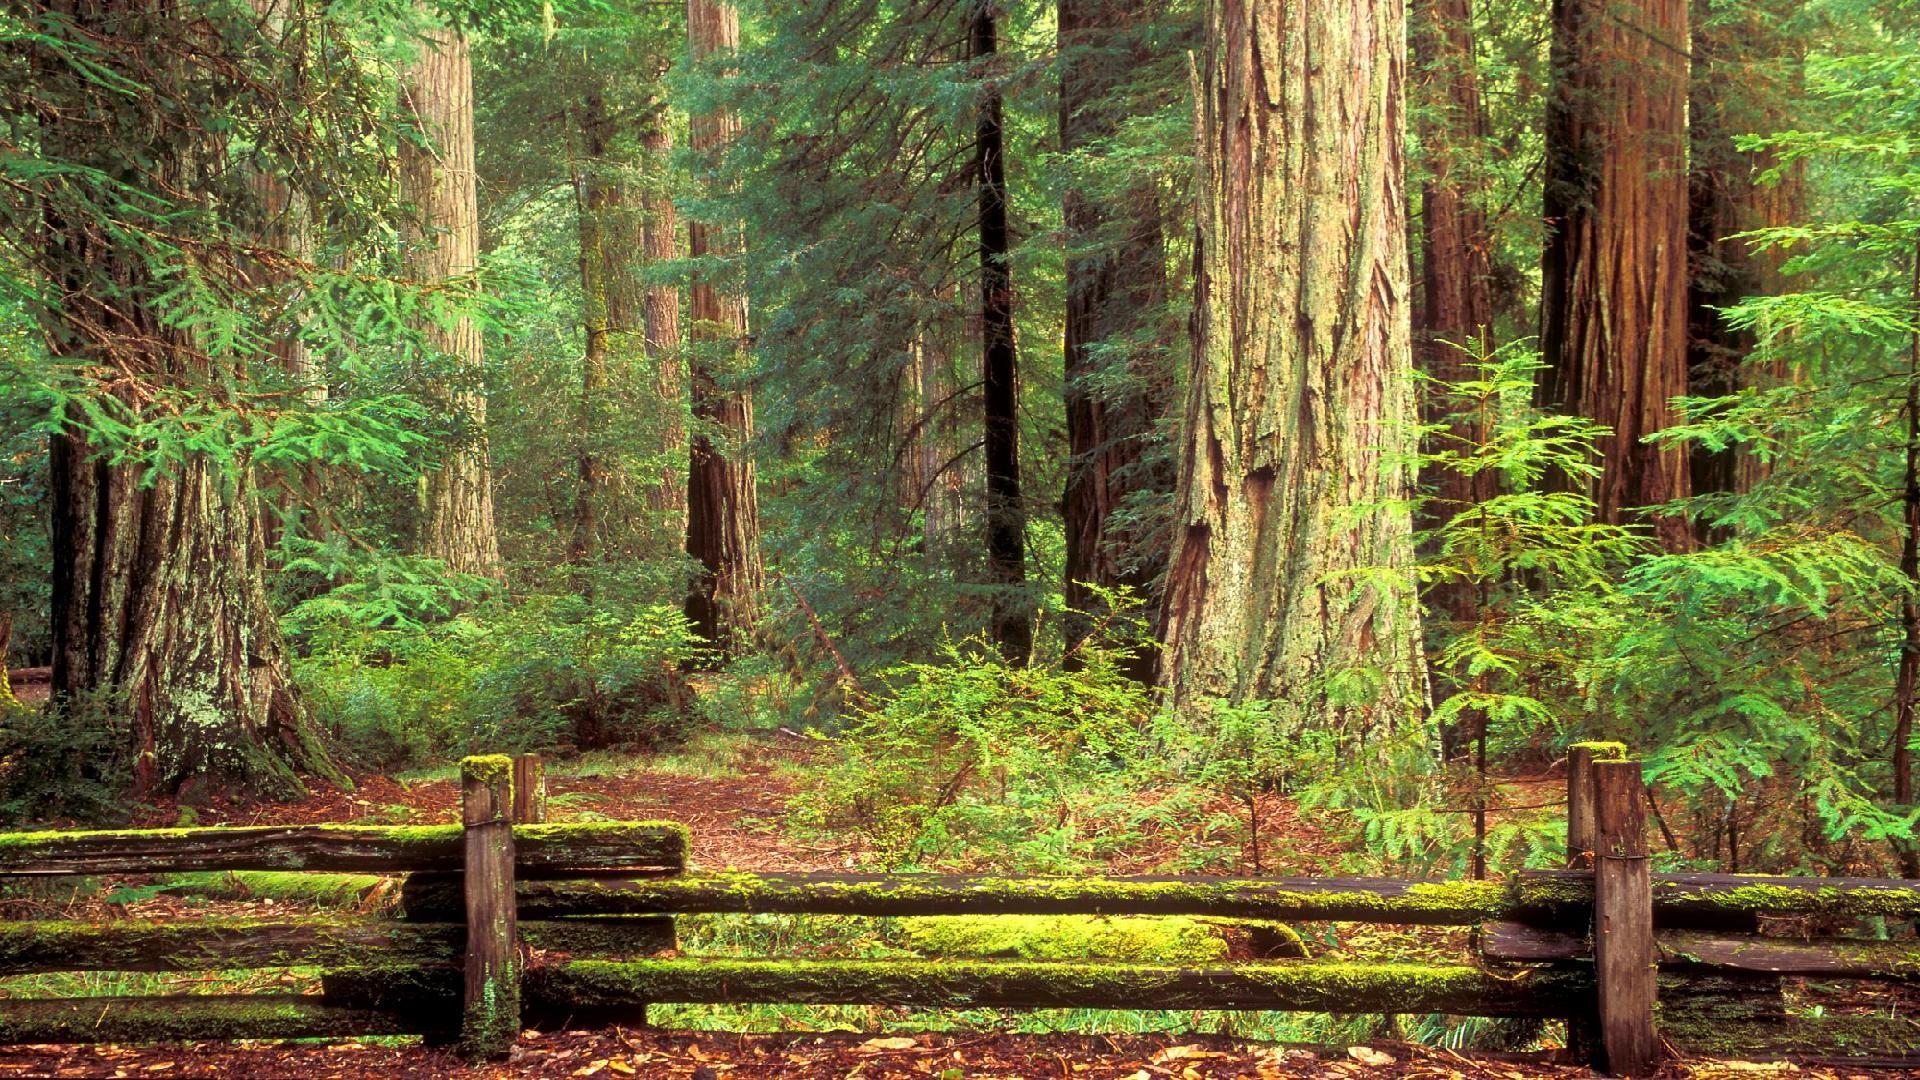 Redwood Forest Wallpaper 183 ① Wallpapertag